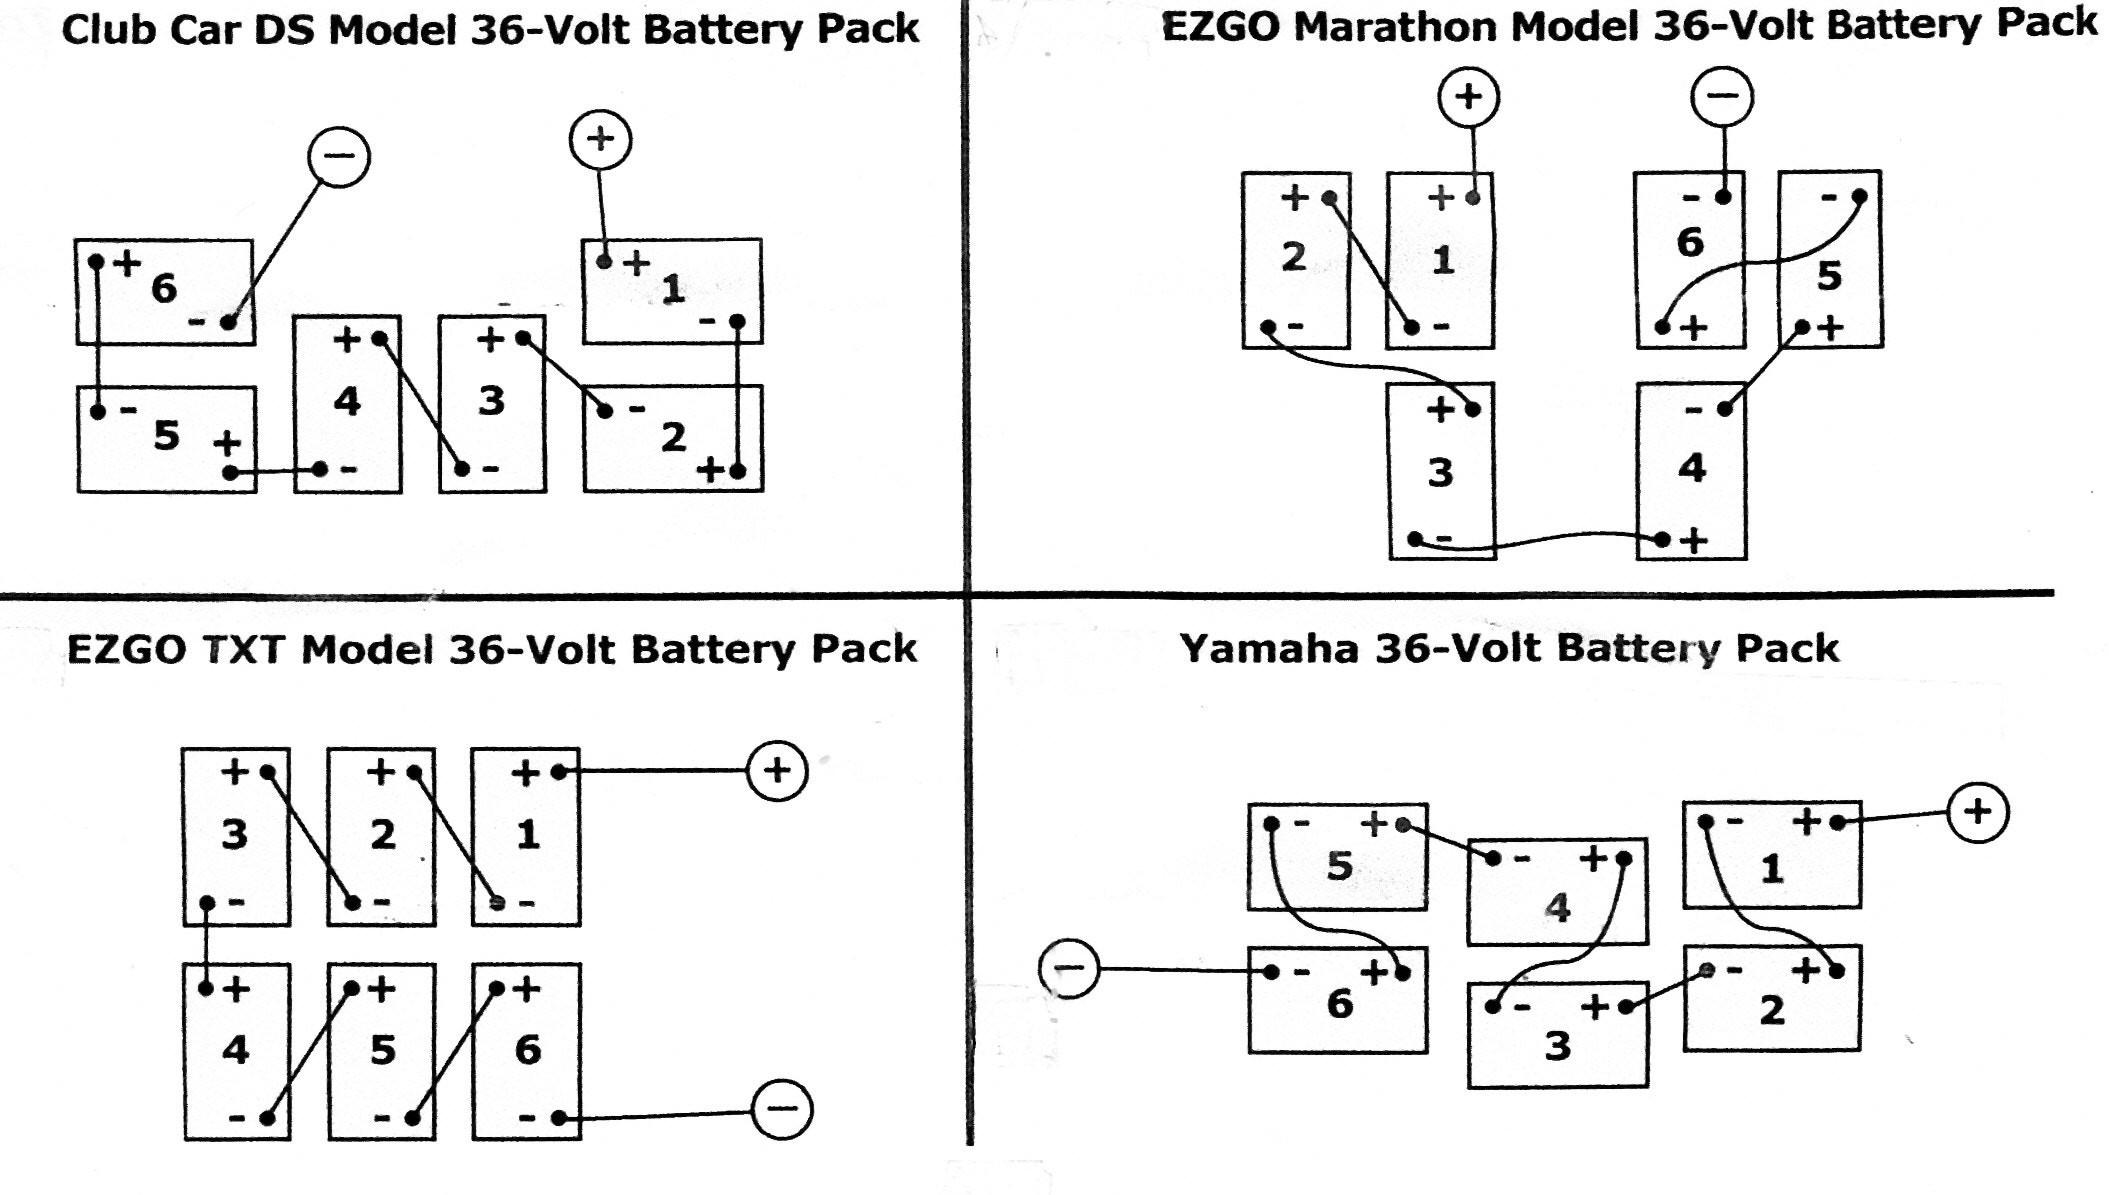 2008 Ezgo Golf Cart 36 Volt Light Wiring Diagram Ez Go Golf Cart Battery Wiring Diagram Free Wiring Diagram